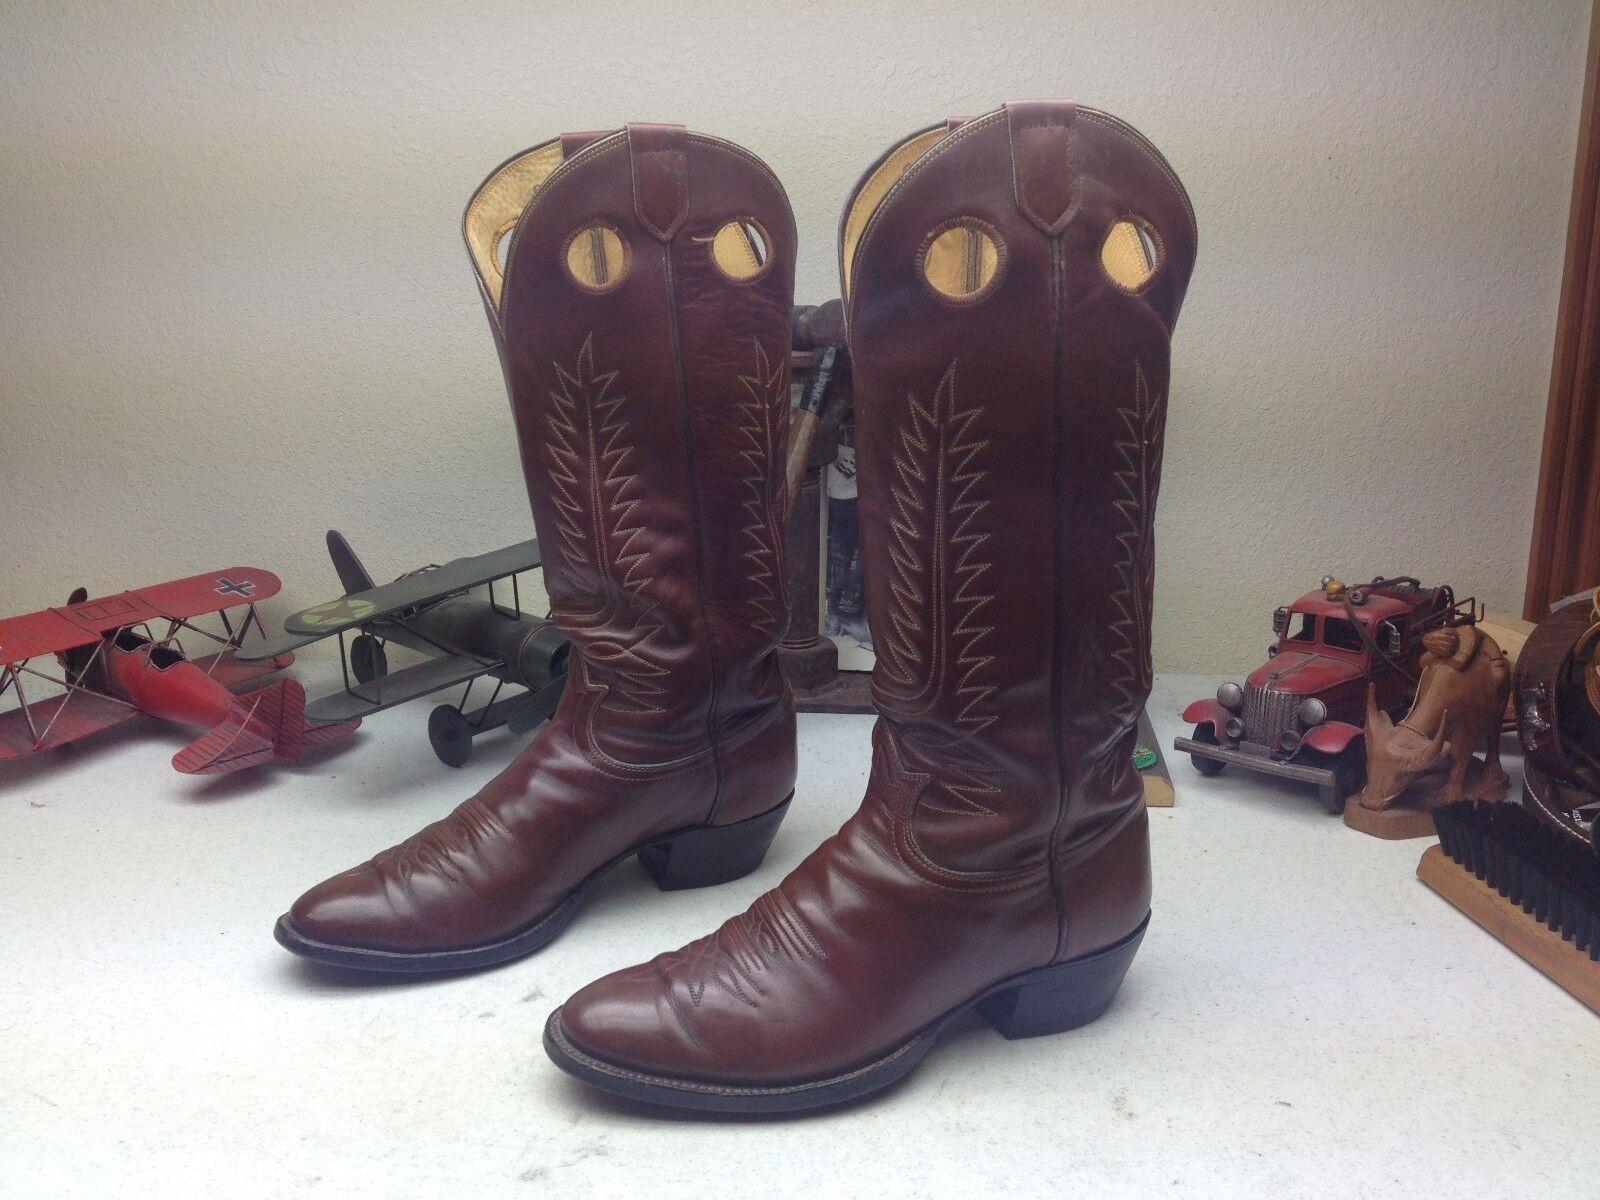 Vintage Buckaroo TONY LAMA 6242 USA ingeniero De Cuero Marrón Trail Boss botas 9.5D